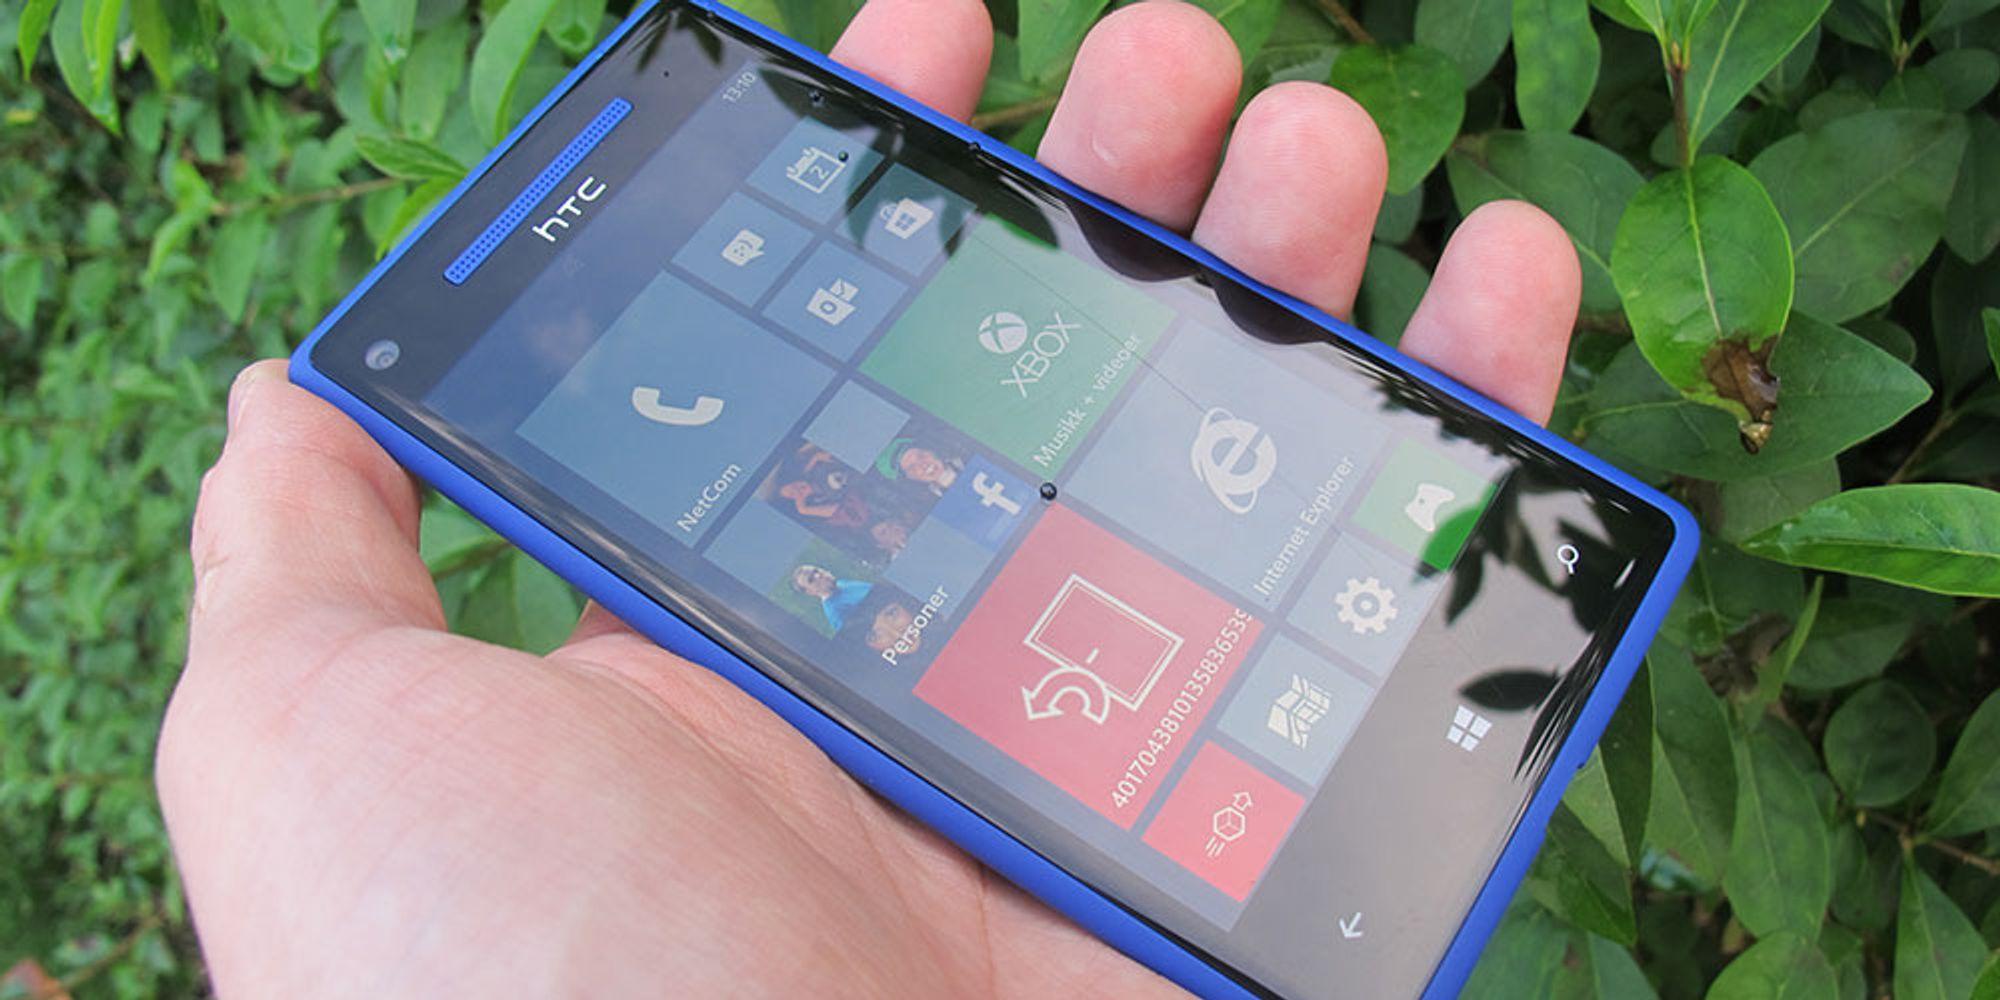 Test: Windows Phone 8X by HTC